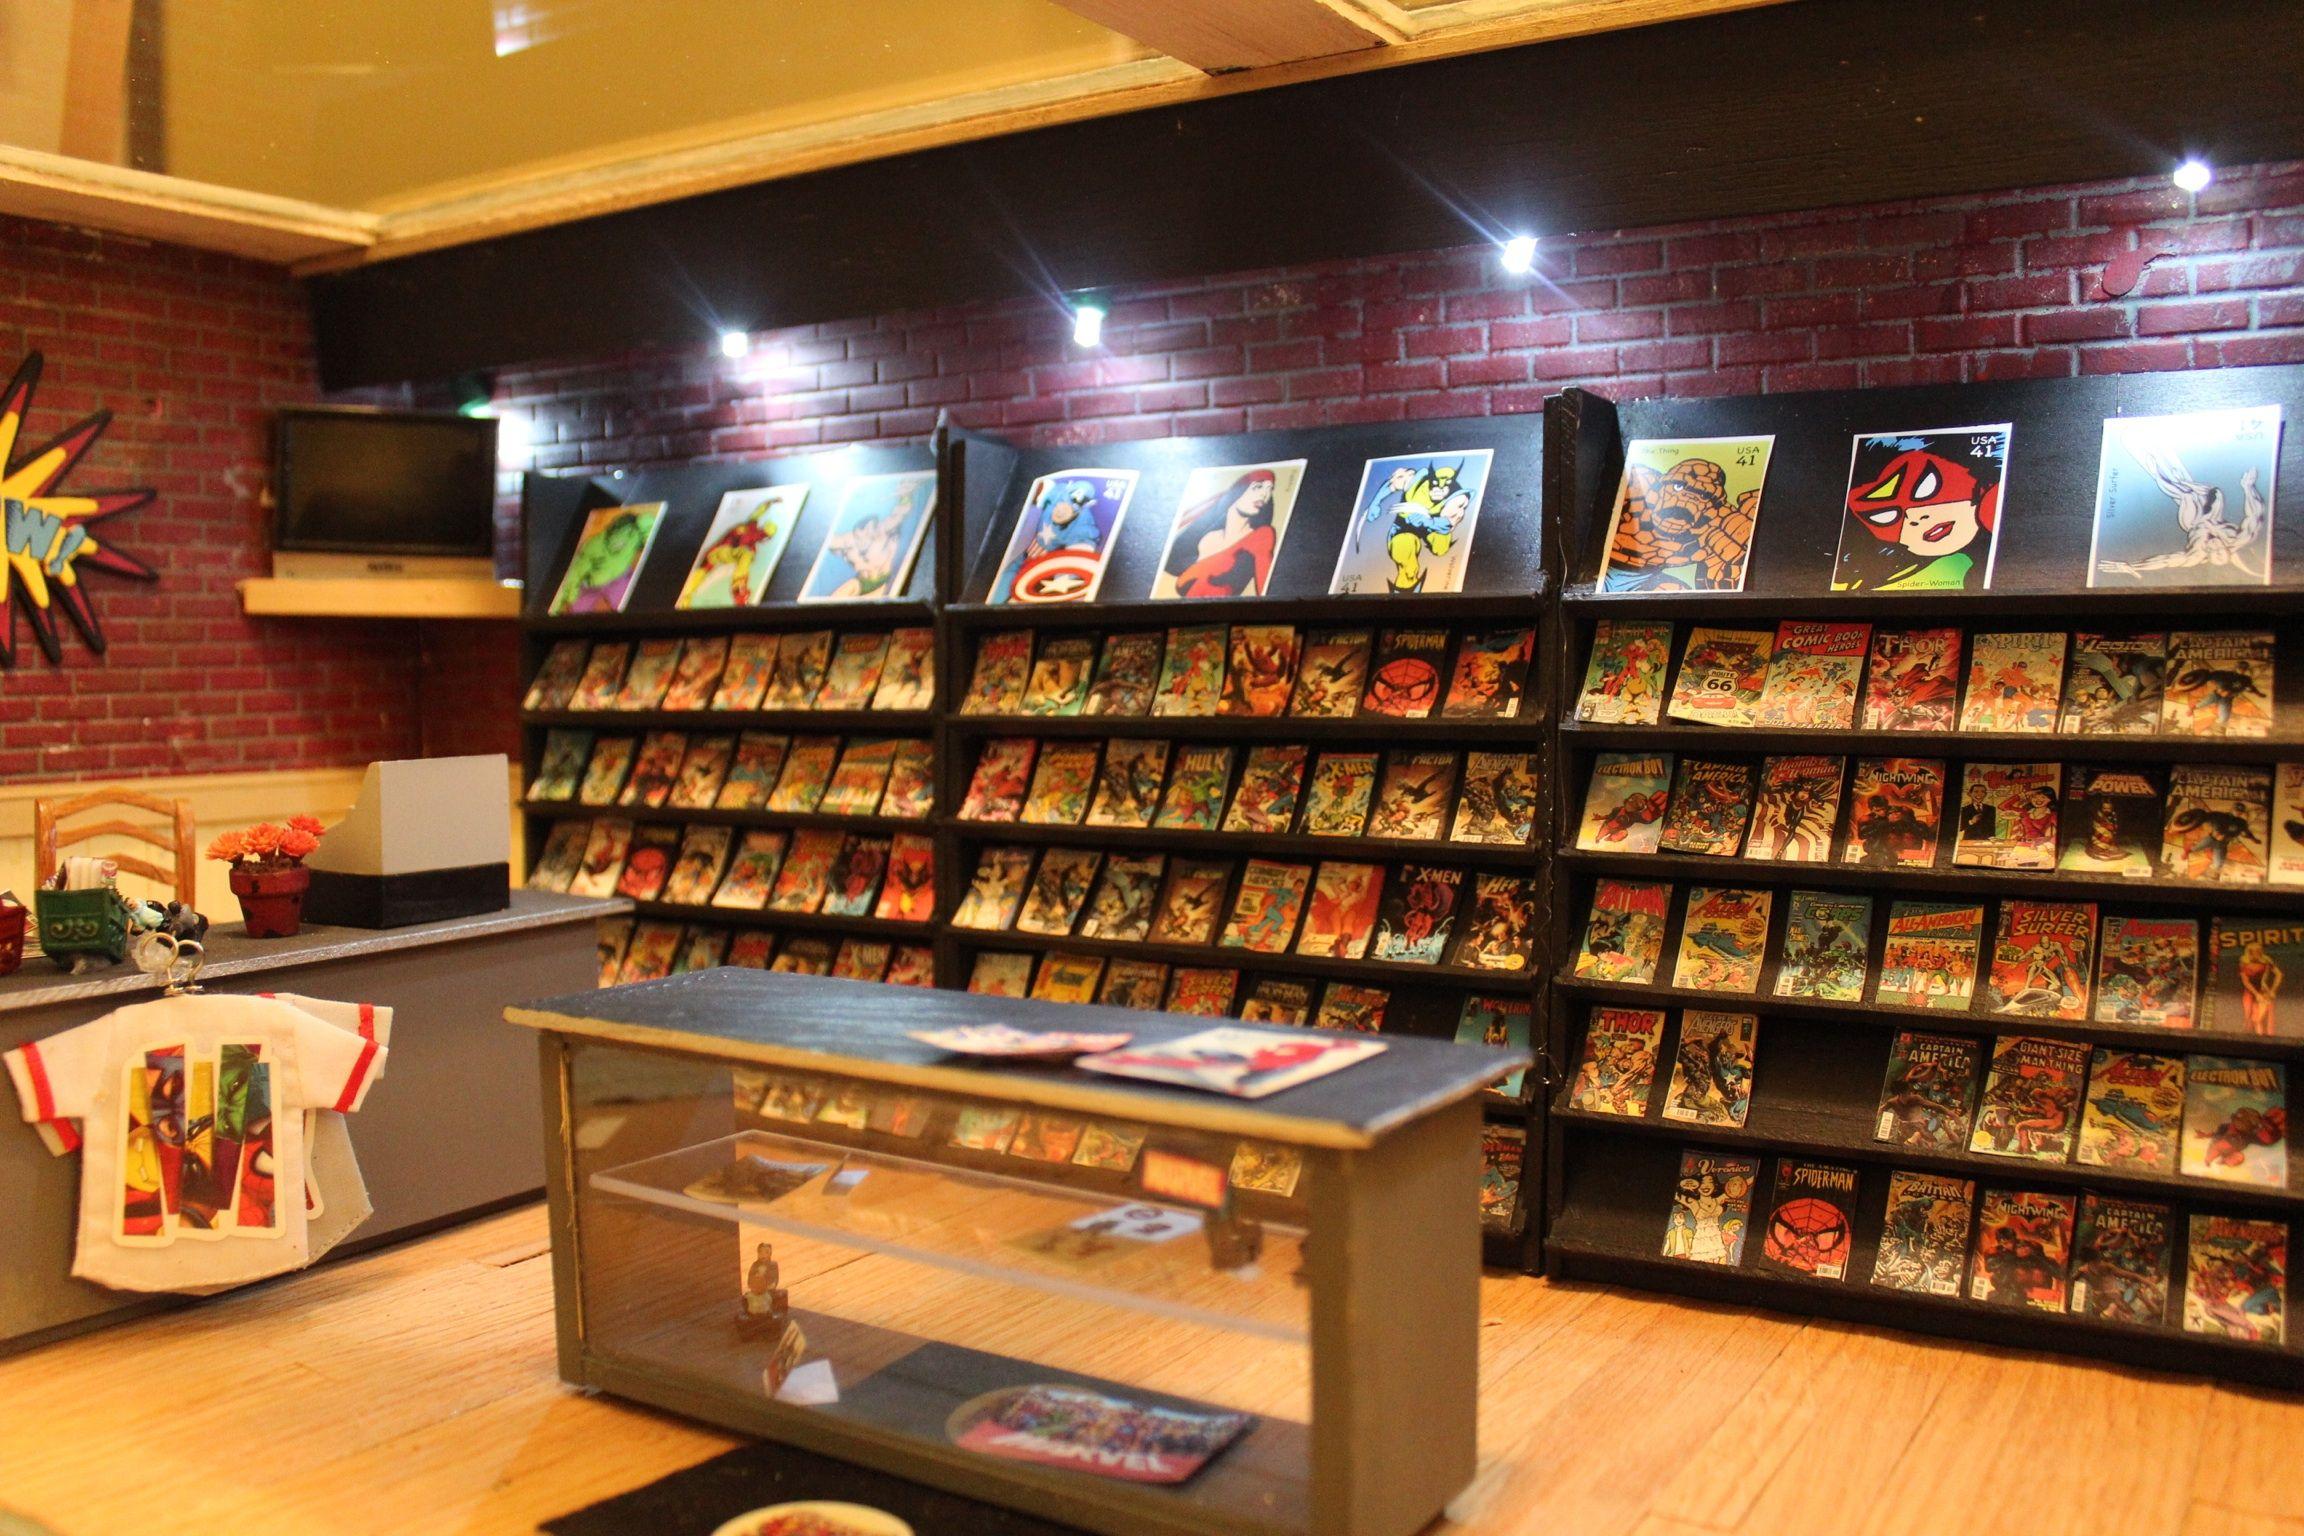 Medium Of Comic Book Shelves